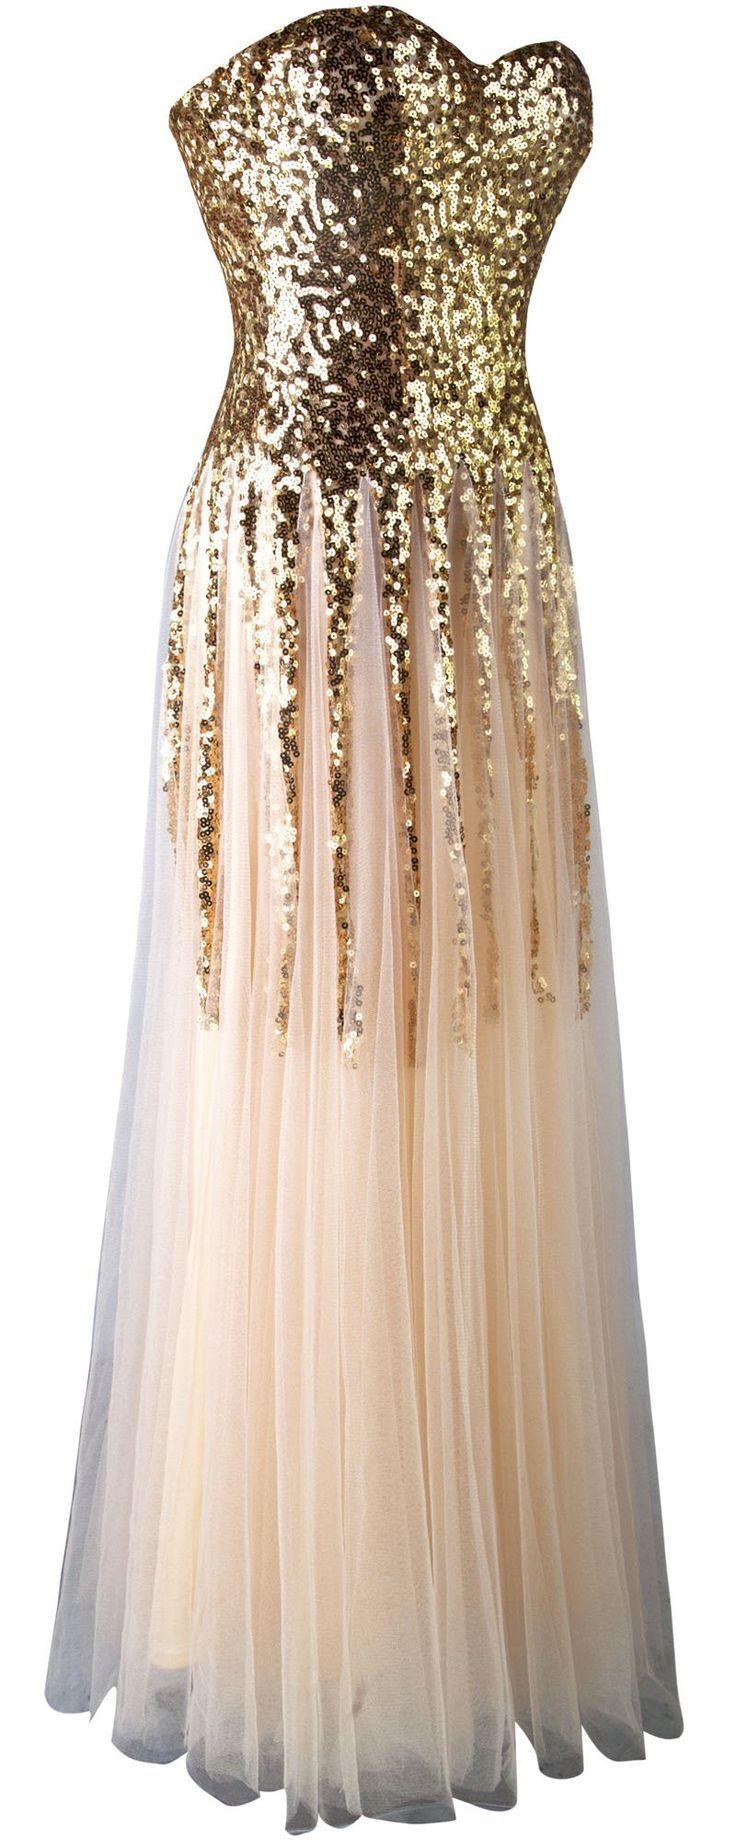 Gold prom dresses amazon good style dresses pinterest dresses